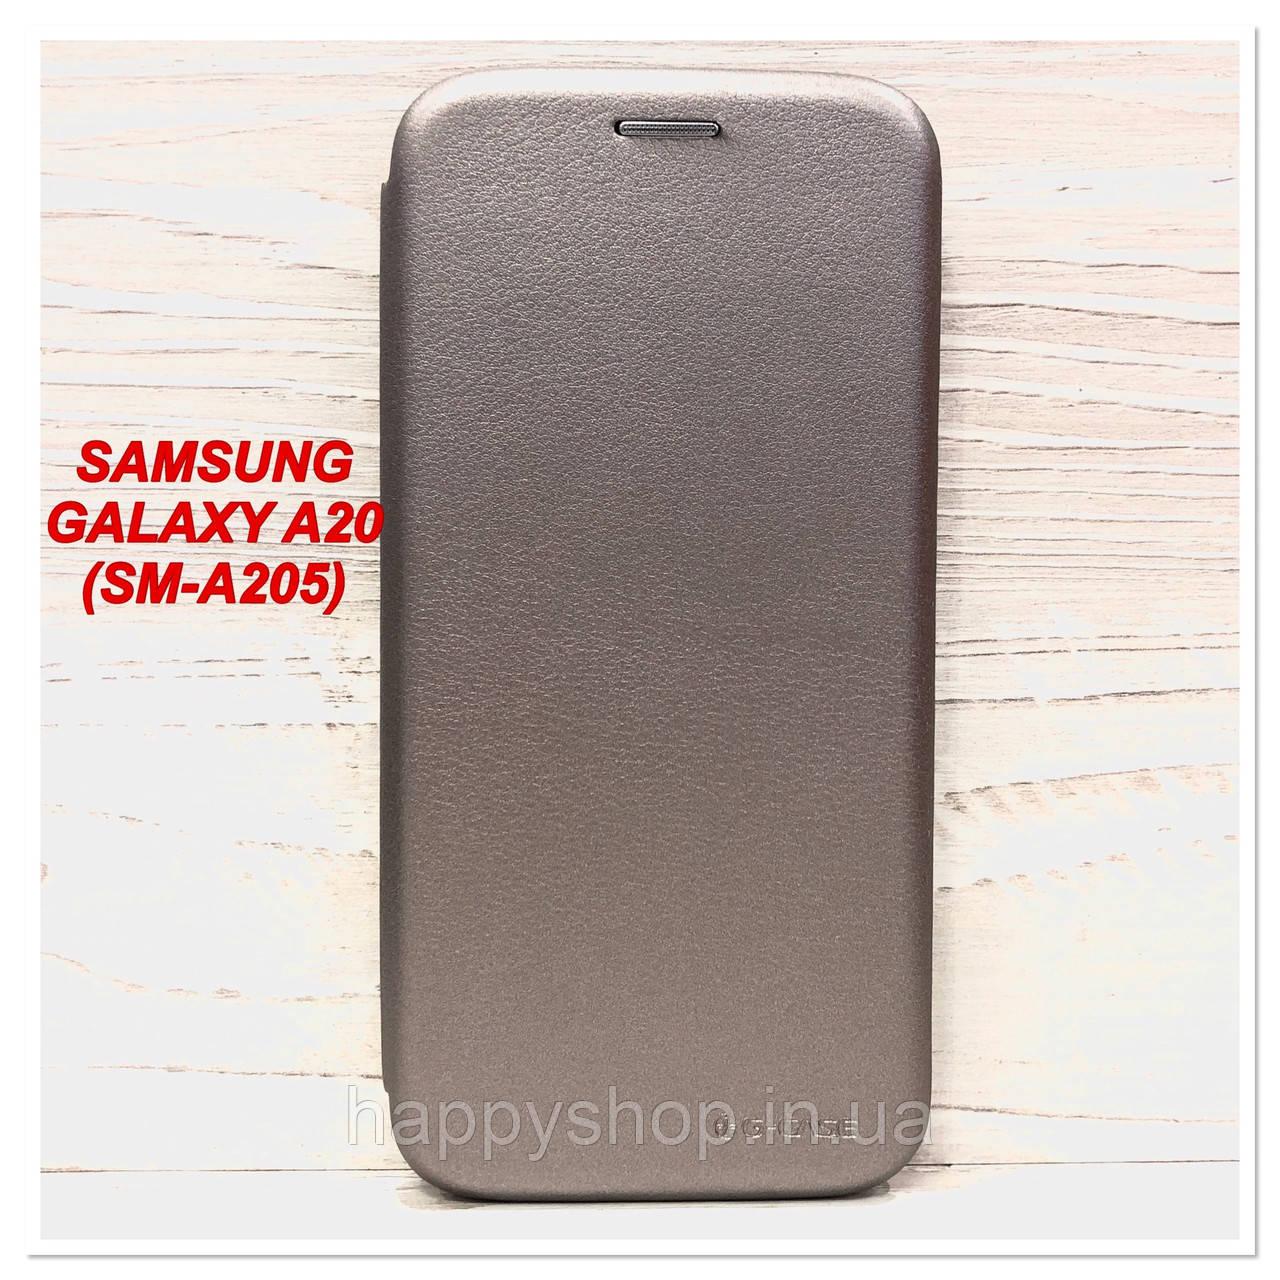 Чехол-книжка G-Case для Samsung Galaxy A20 (SM-A205) Серый